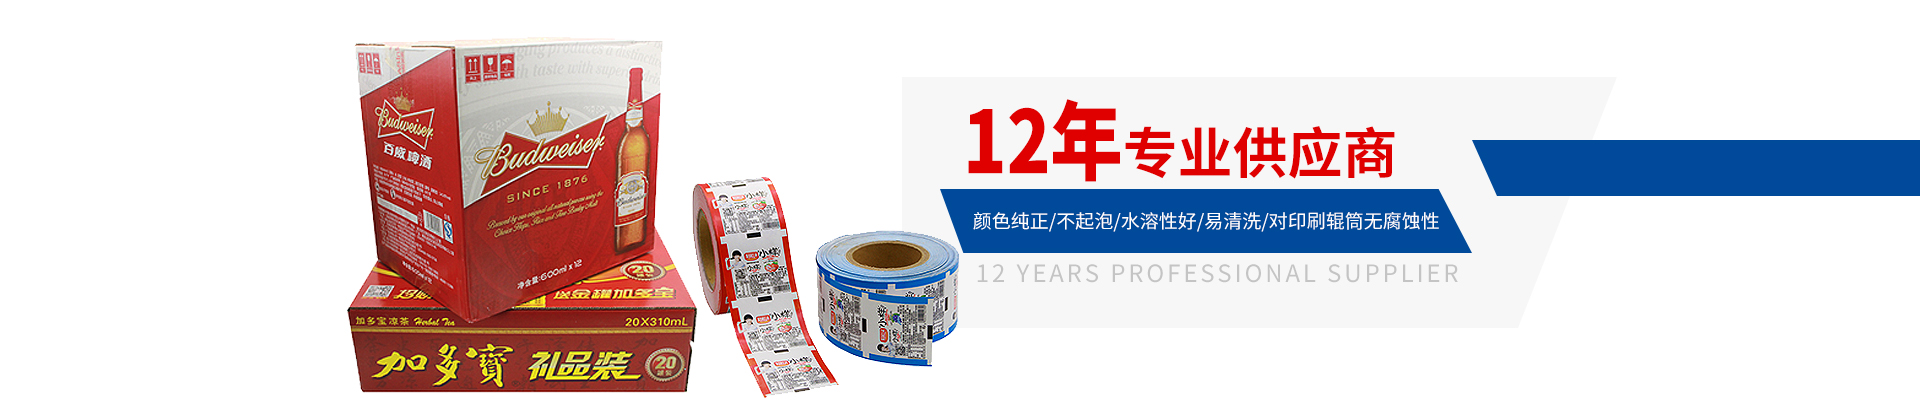 http://www.yingcaiink.com/data/upload/202006/20200604155449_768.jpg